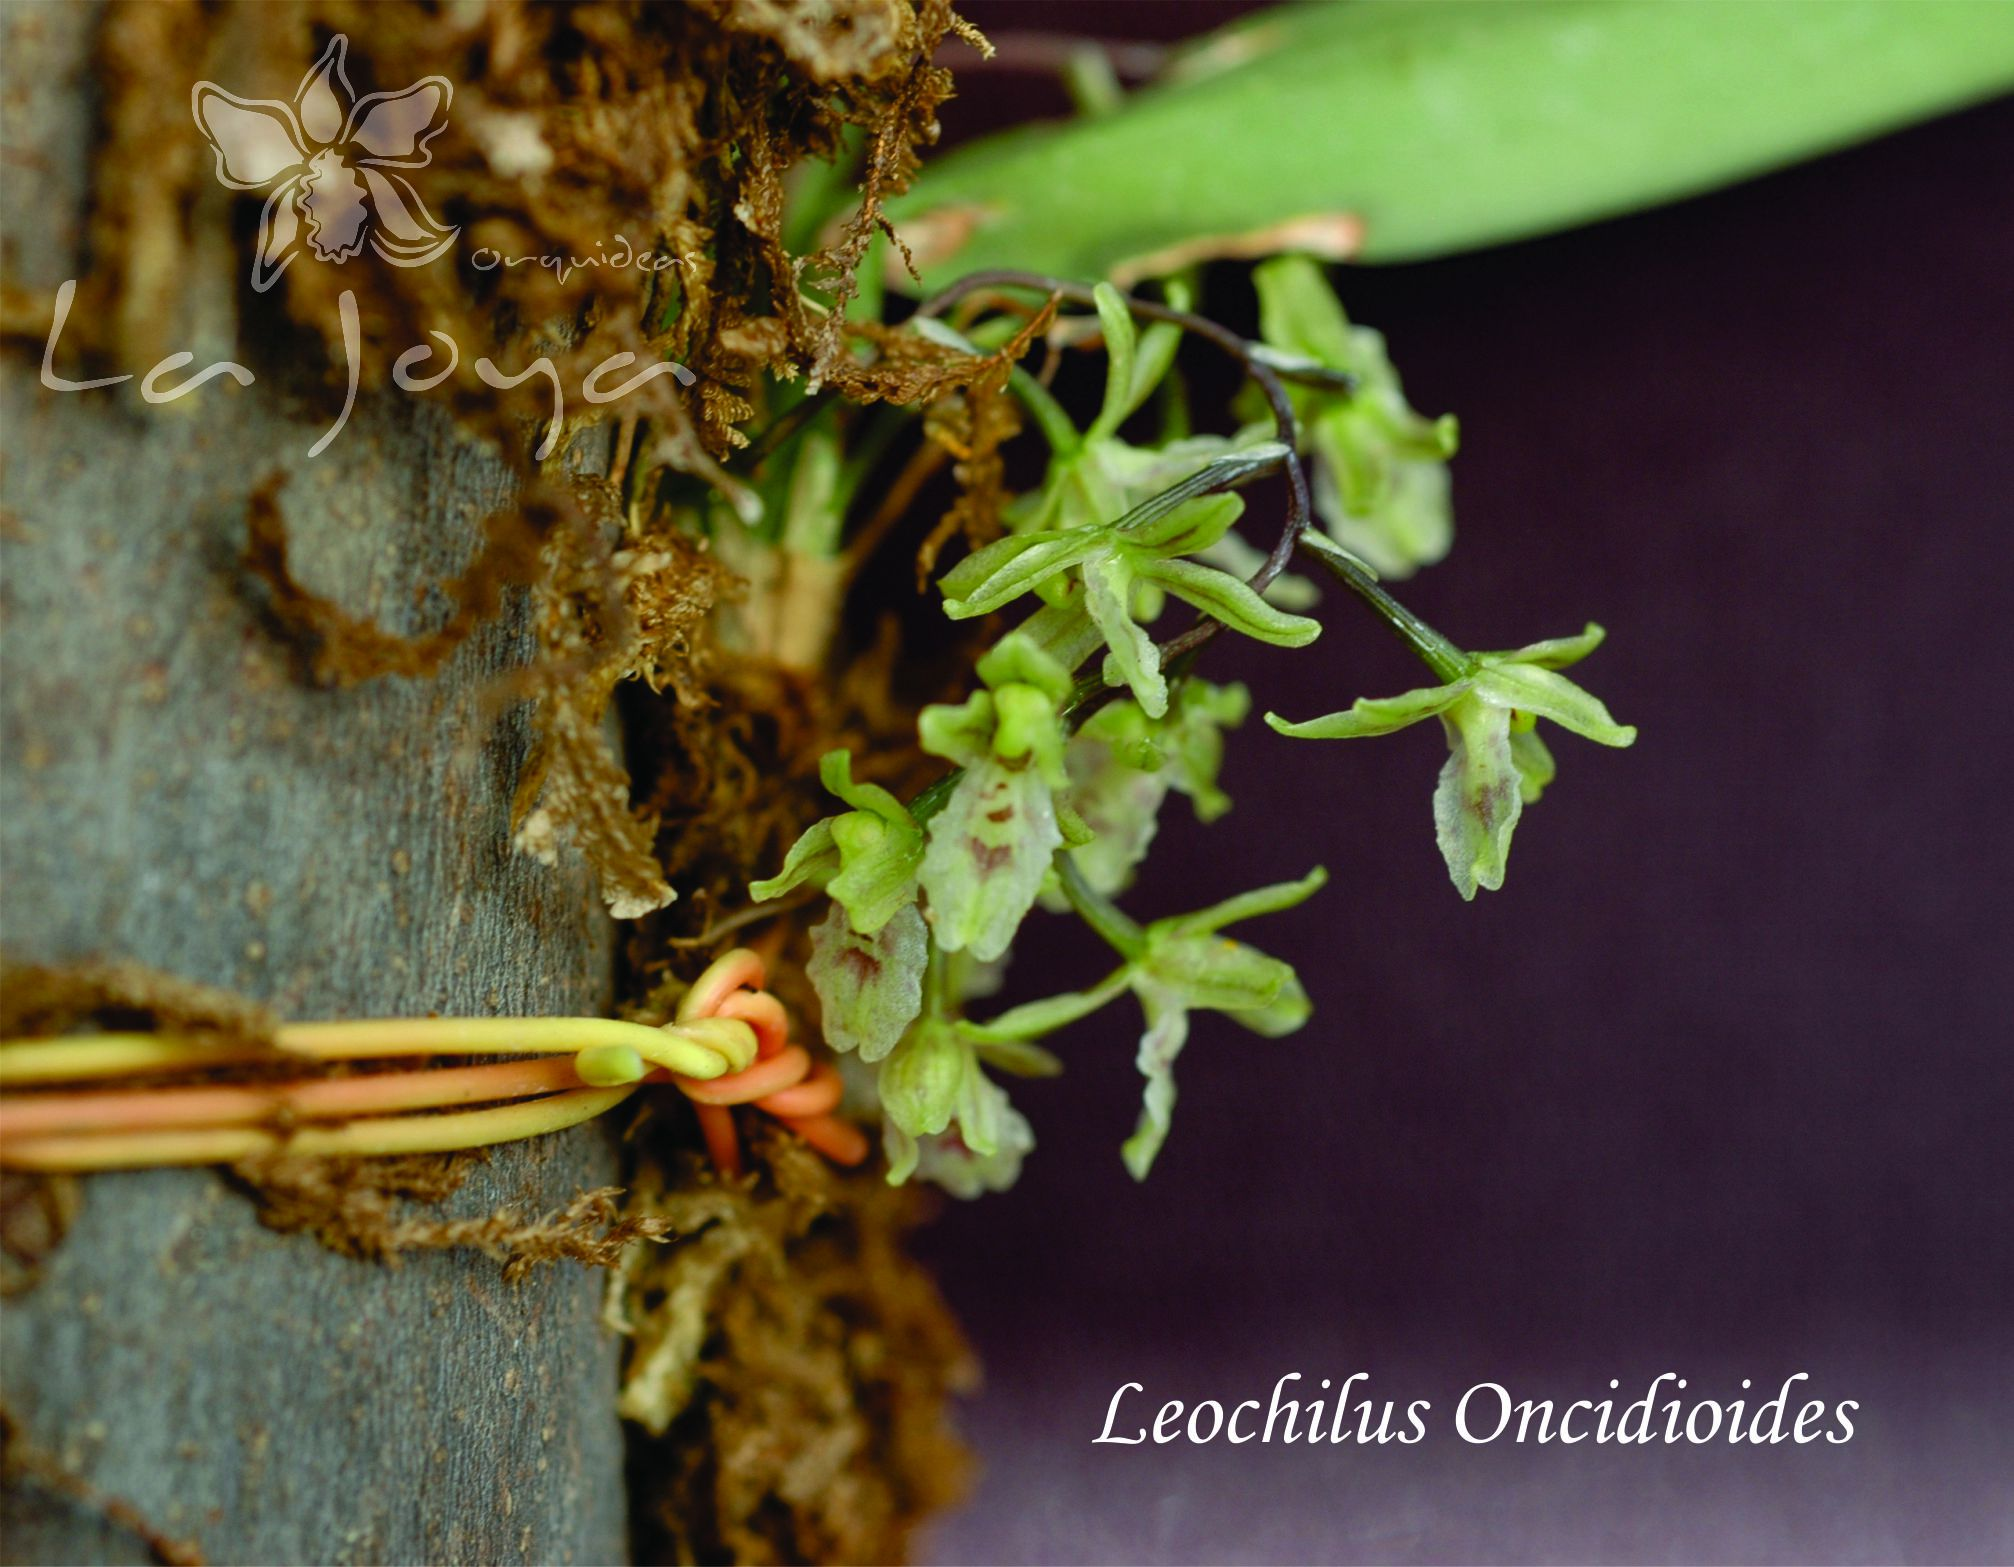 Leochilus Oncidioides